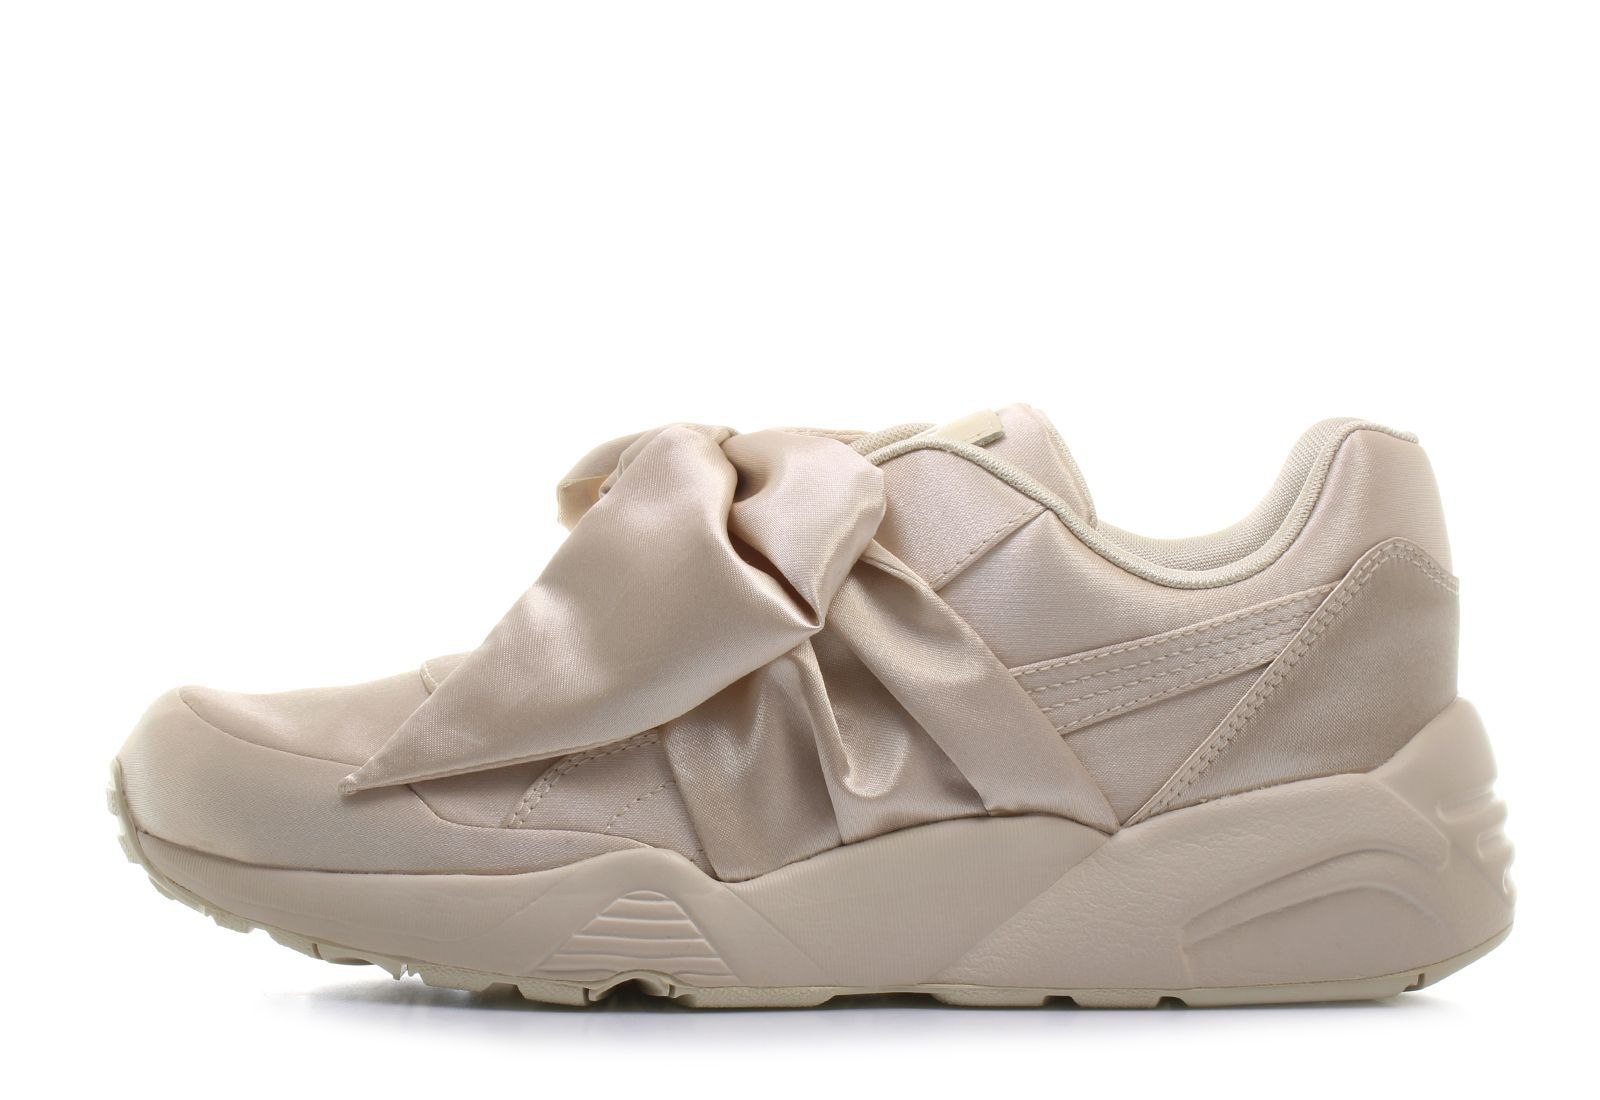 puma fenty, Puma Women Shoes Puma Basket Platform Metallic